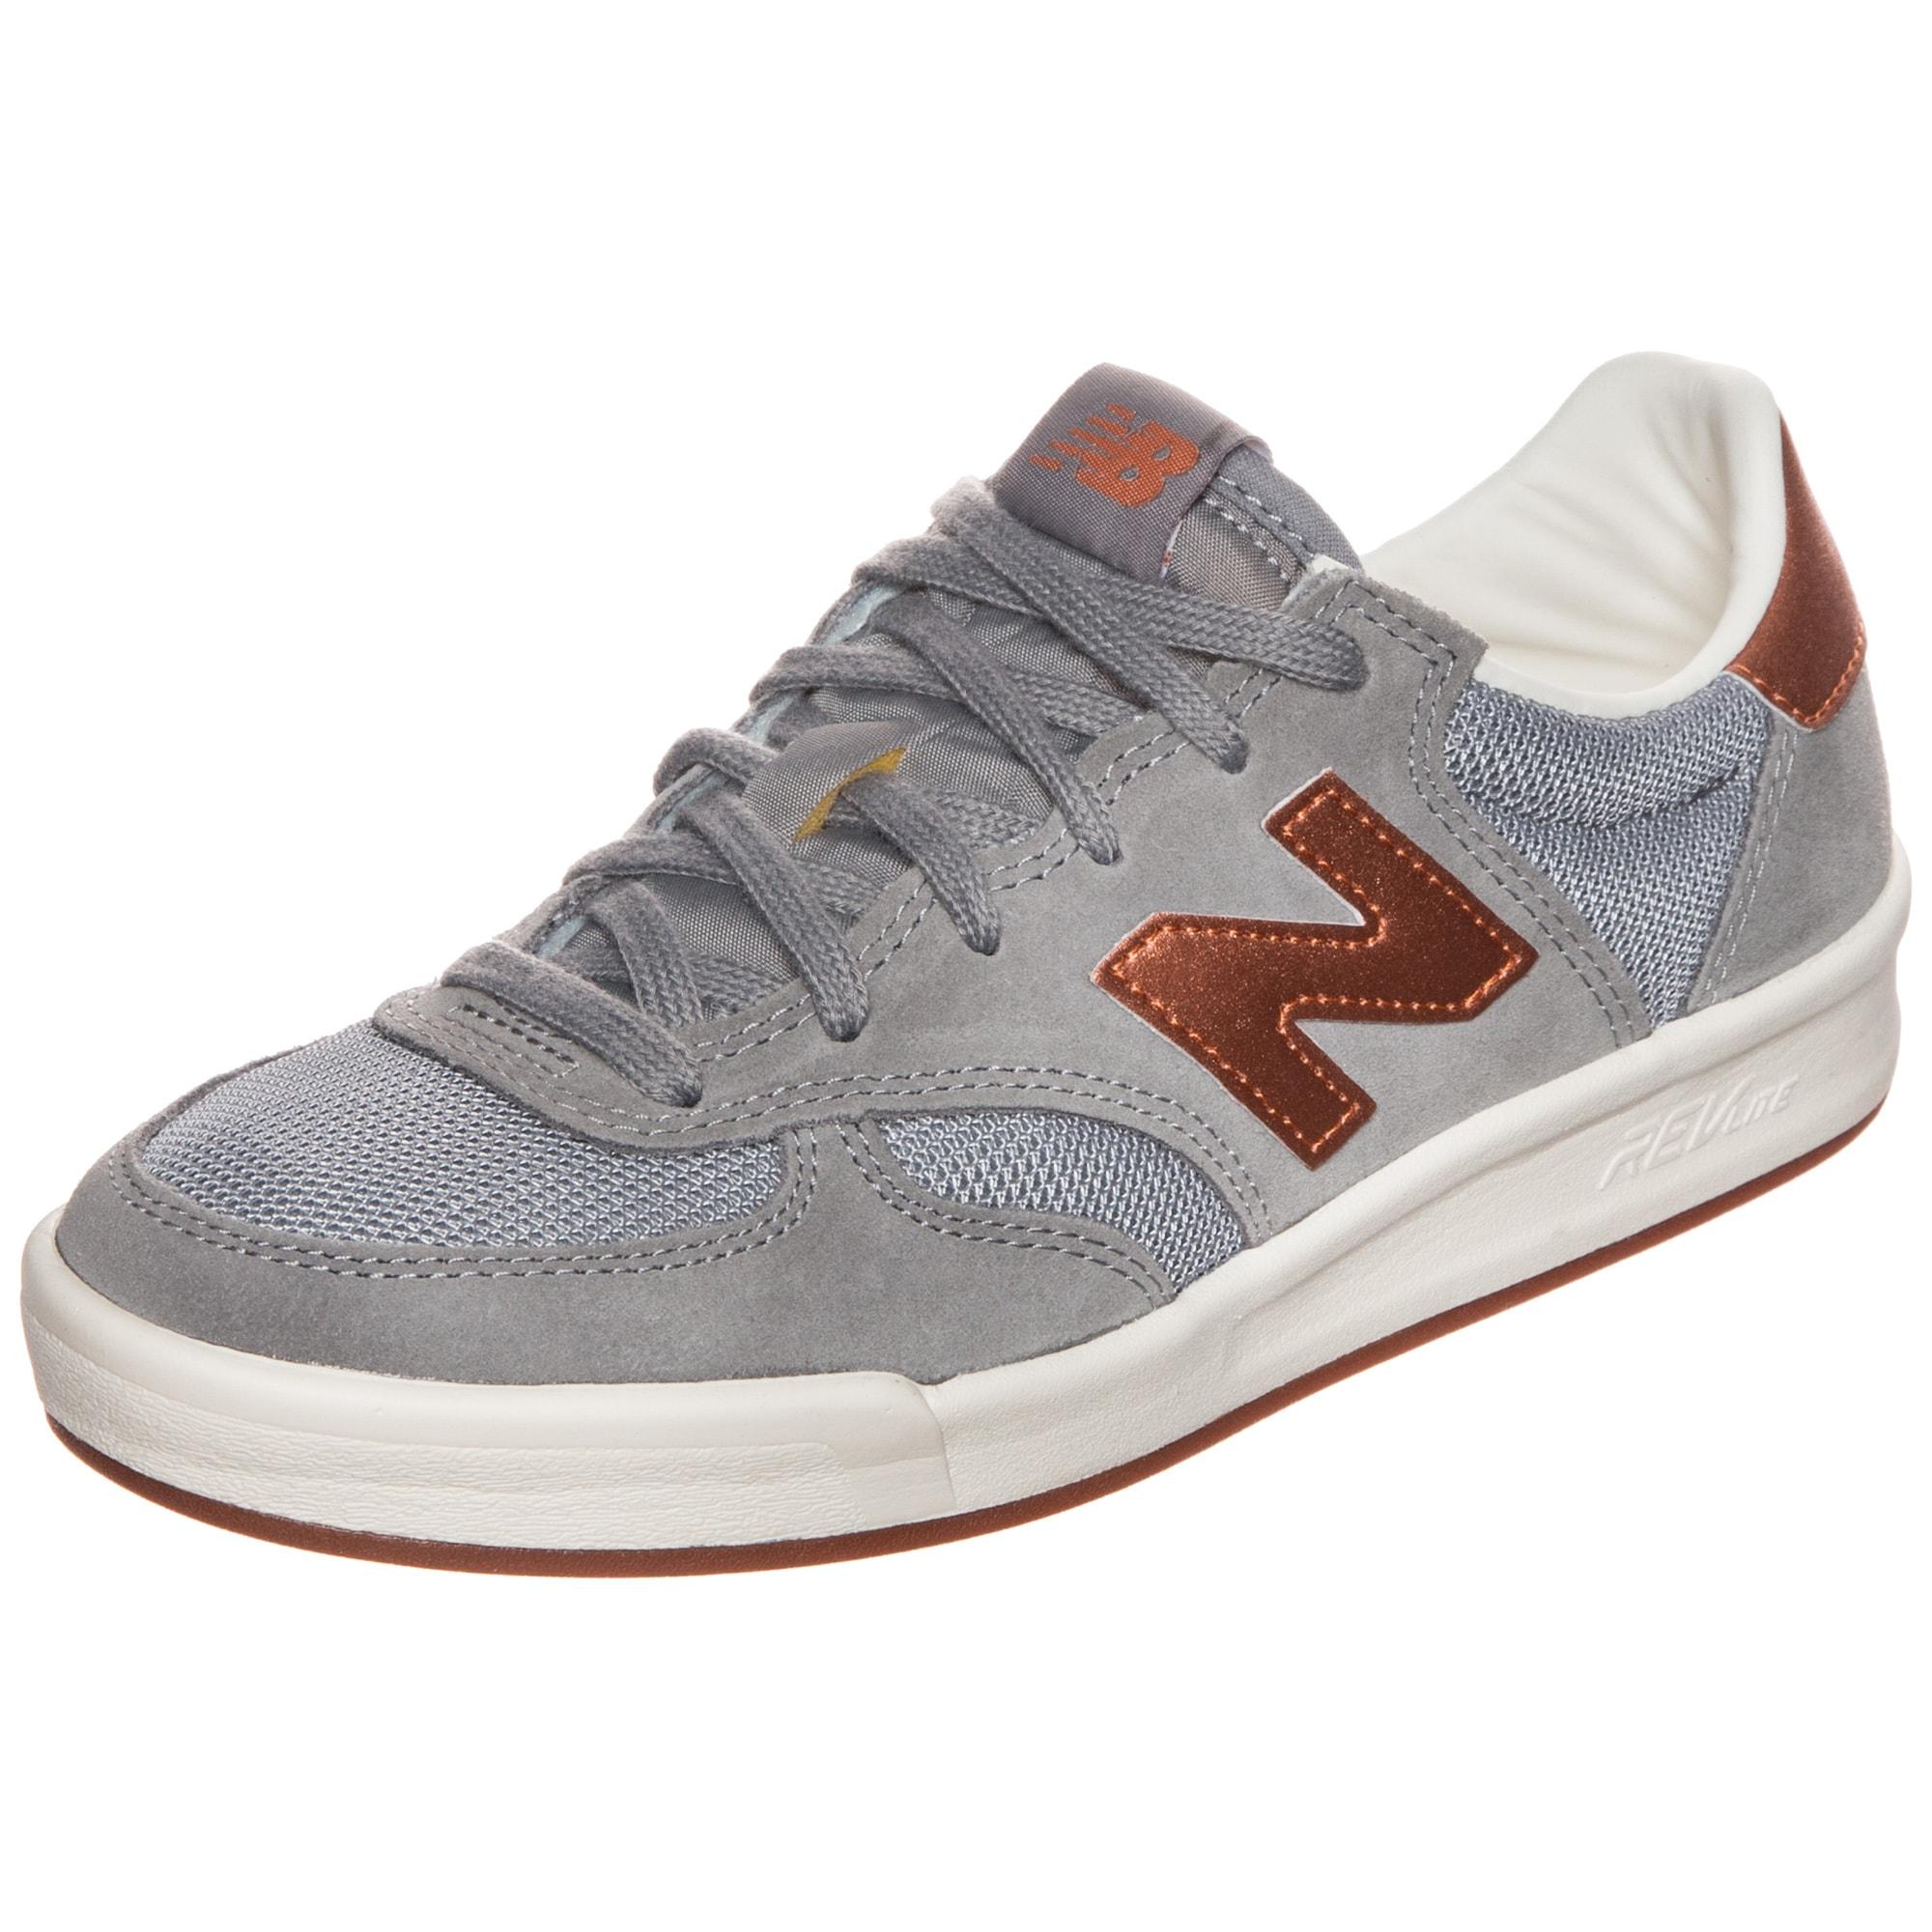 New Balance WRT300 Sneaker bronze rauchgrau ? | Günstig